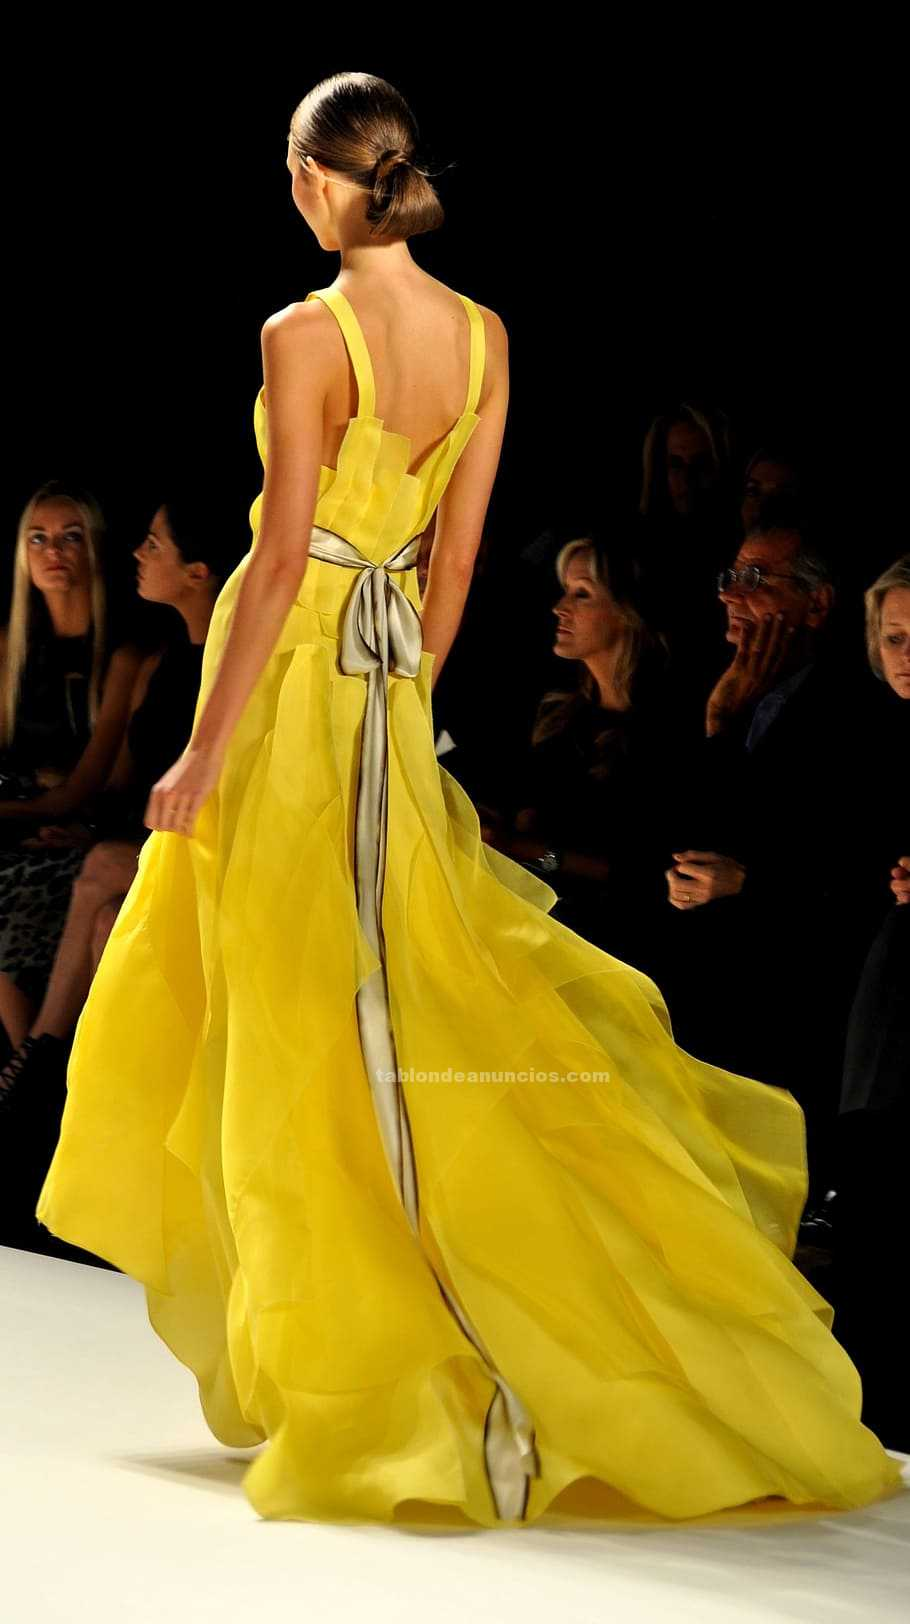 Chica jóven para realizar editorial de moda